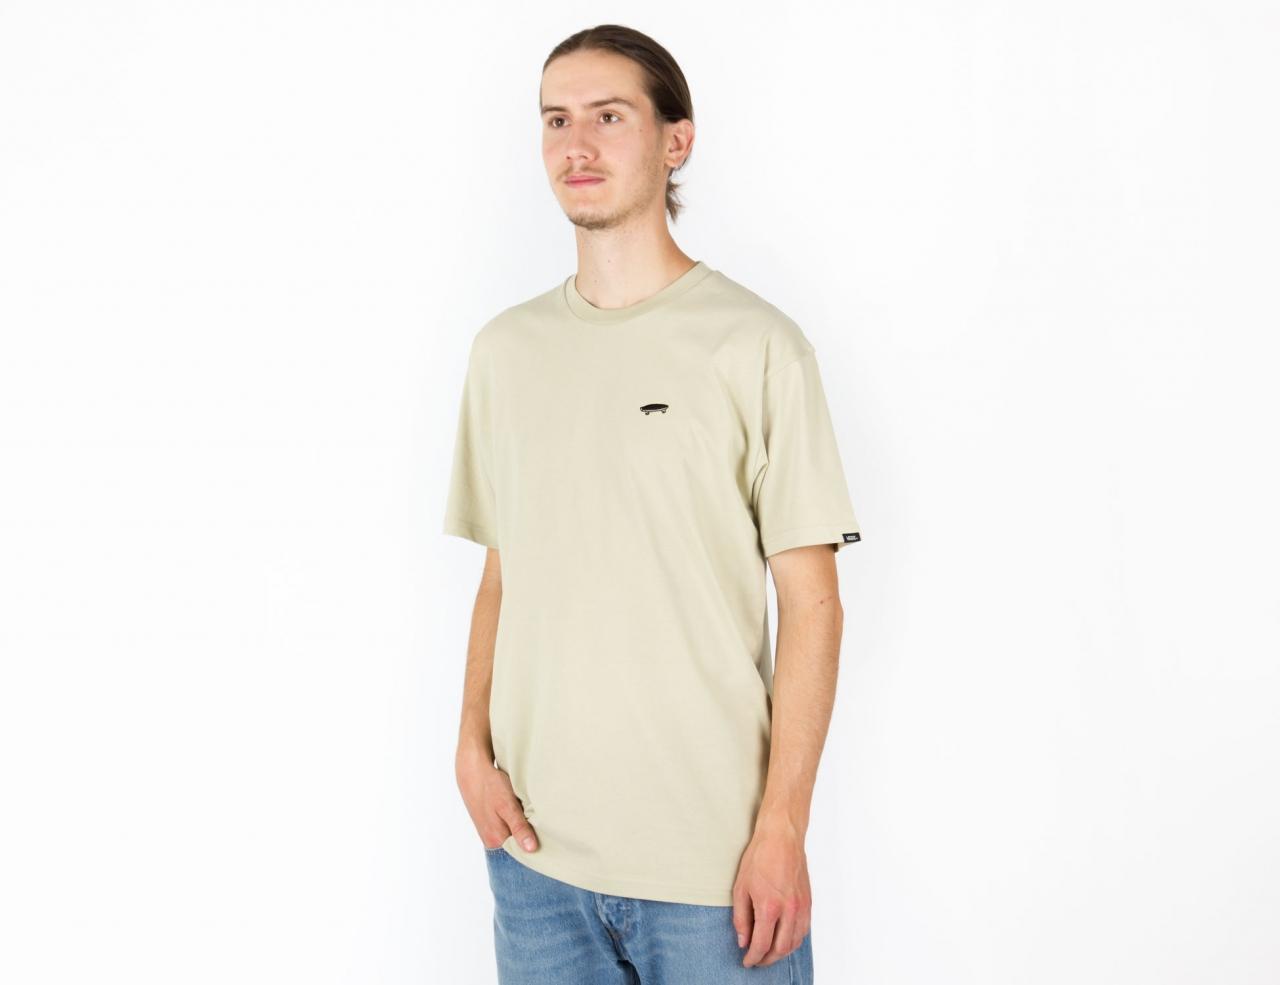 VANS Skate Classic T-Shirt